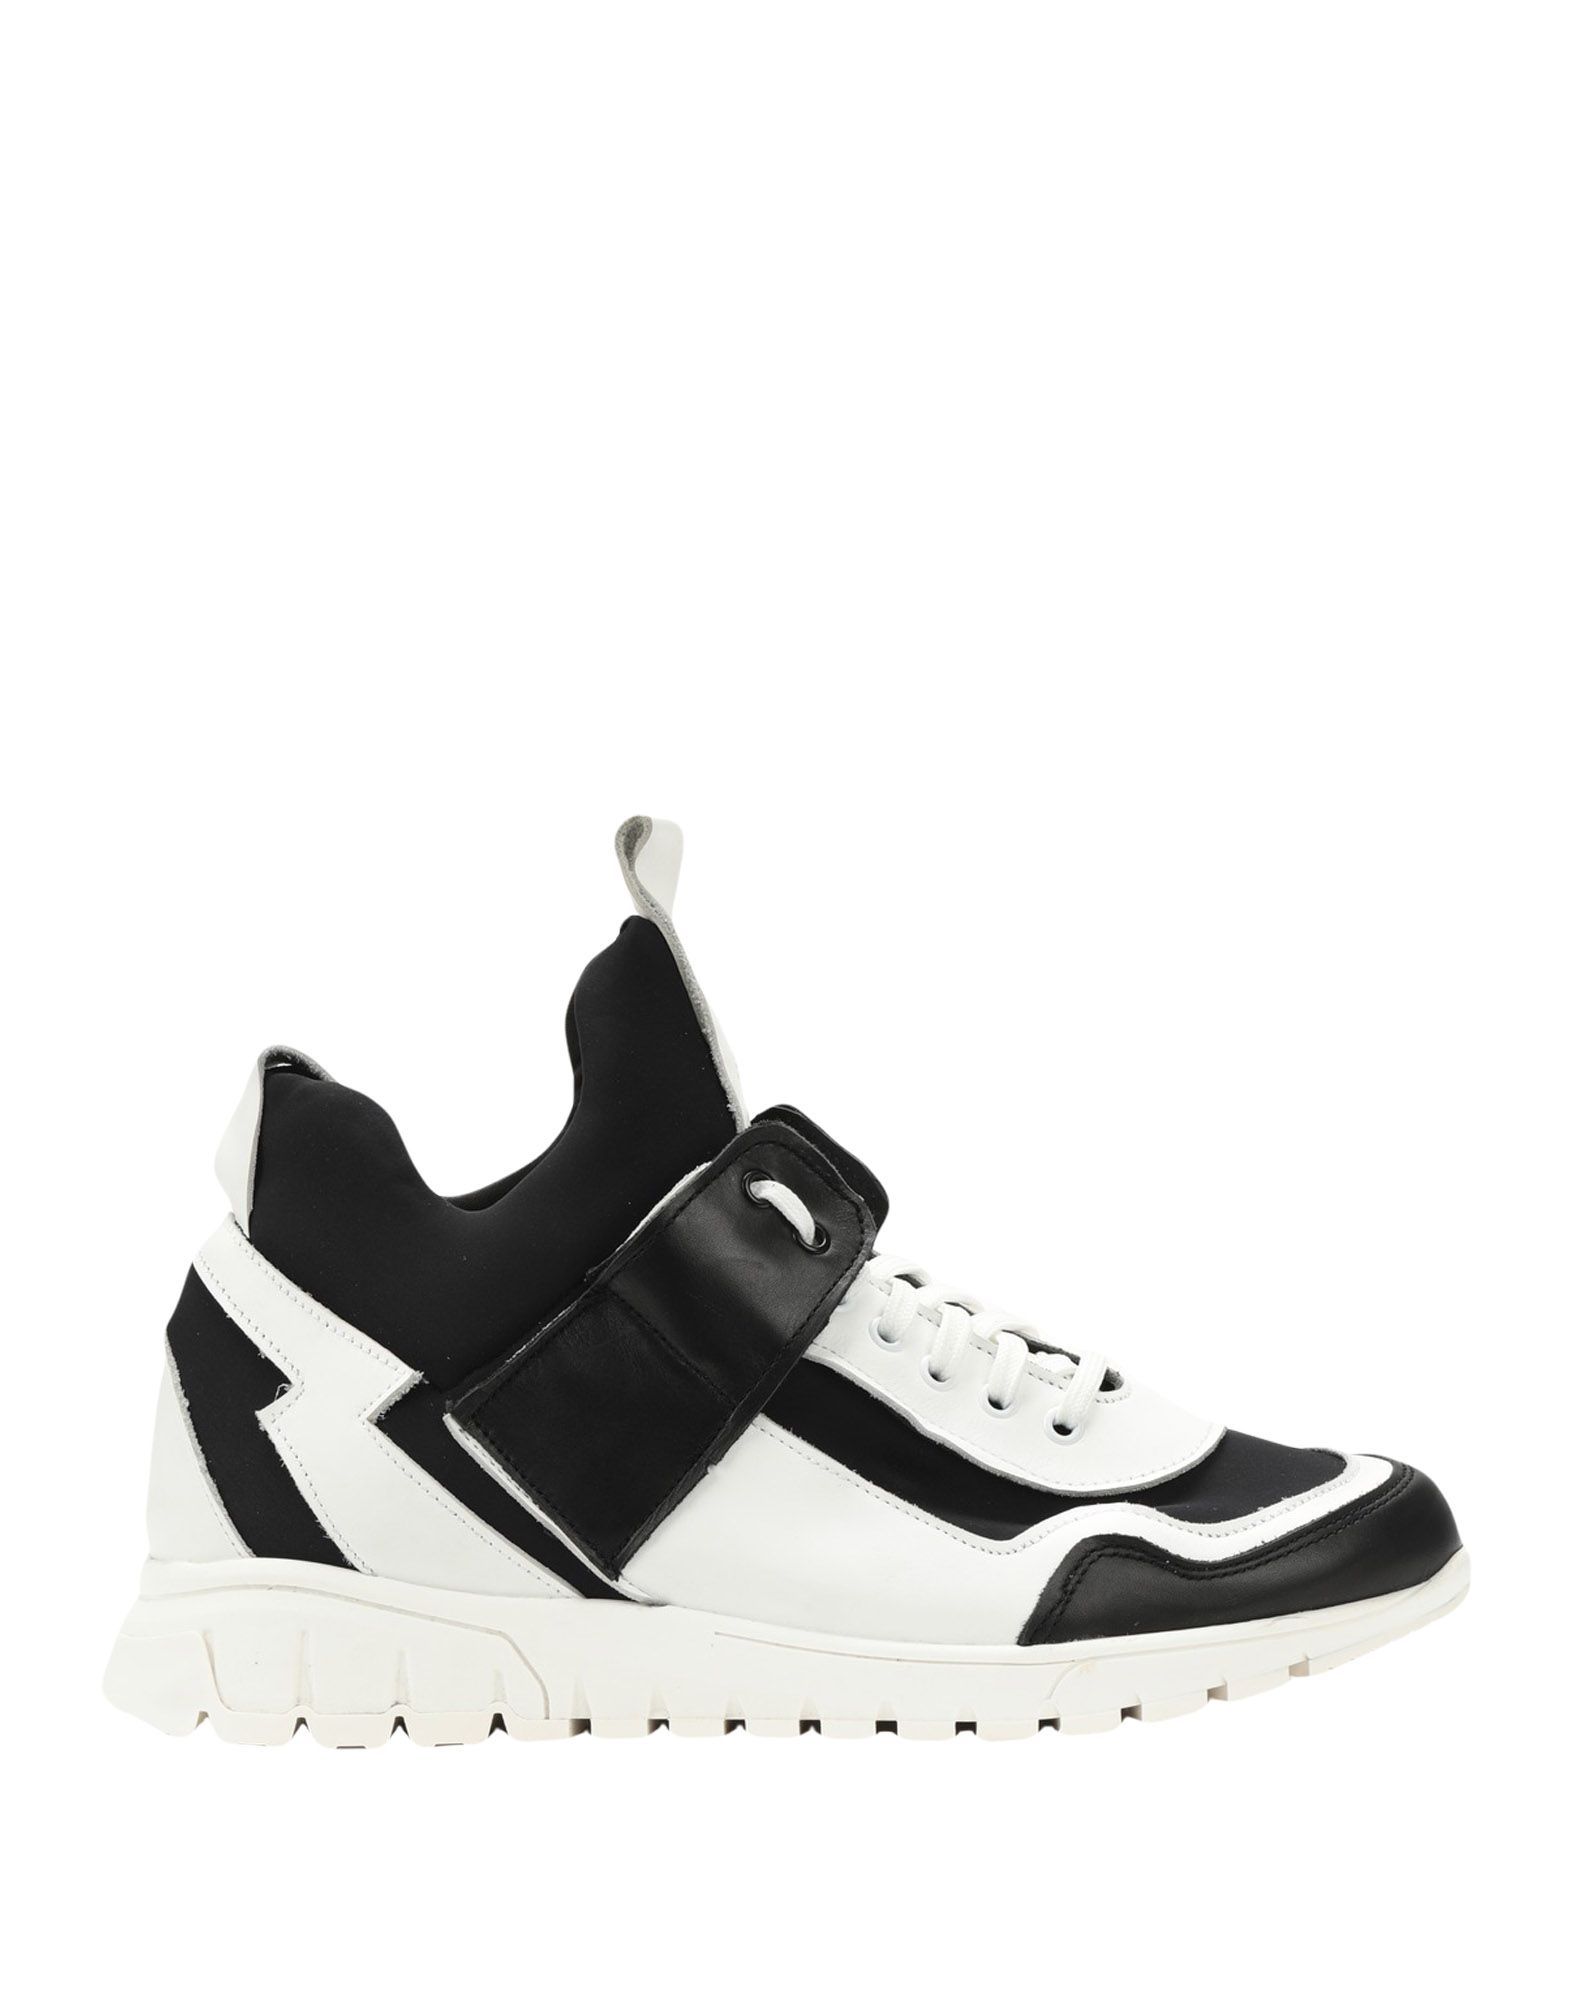 Savio Barbato Sneakers Herren  11540054QL Gute Qualität beliebte Schuhe